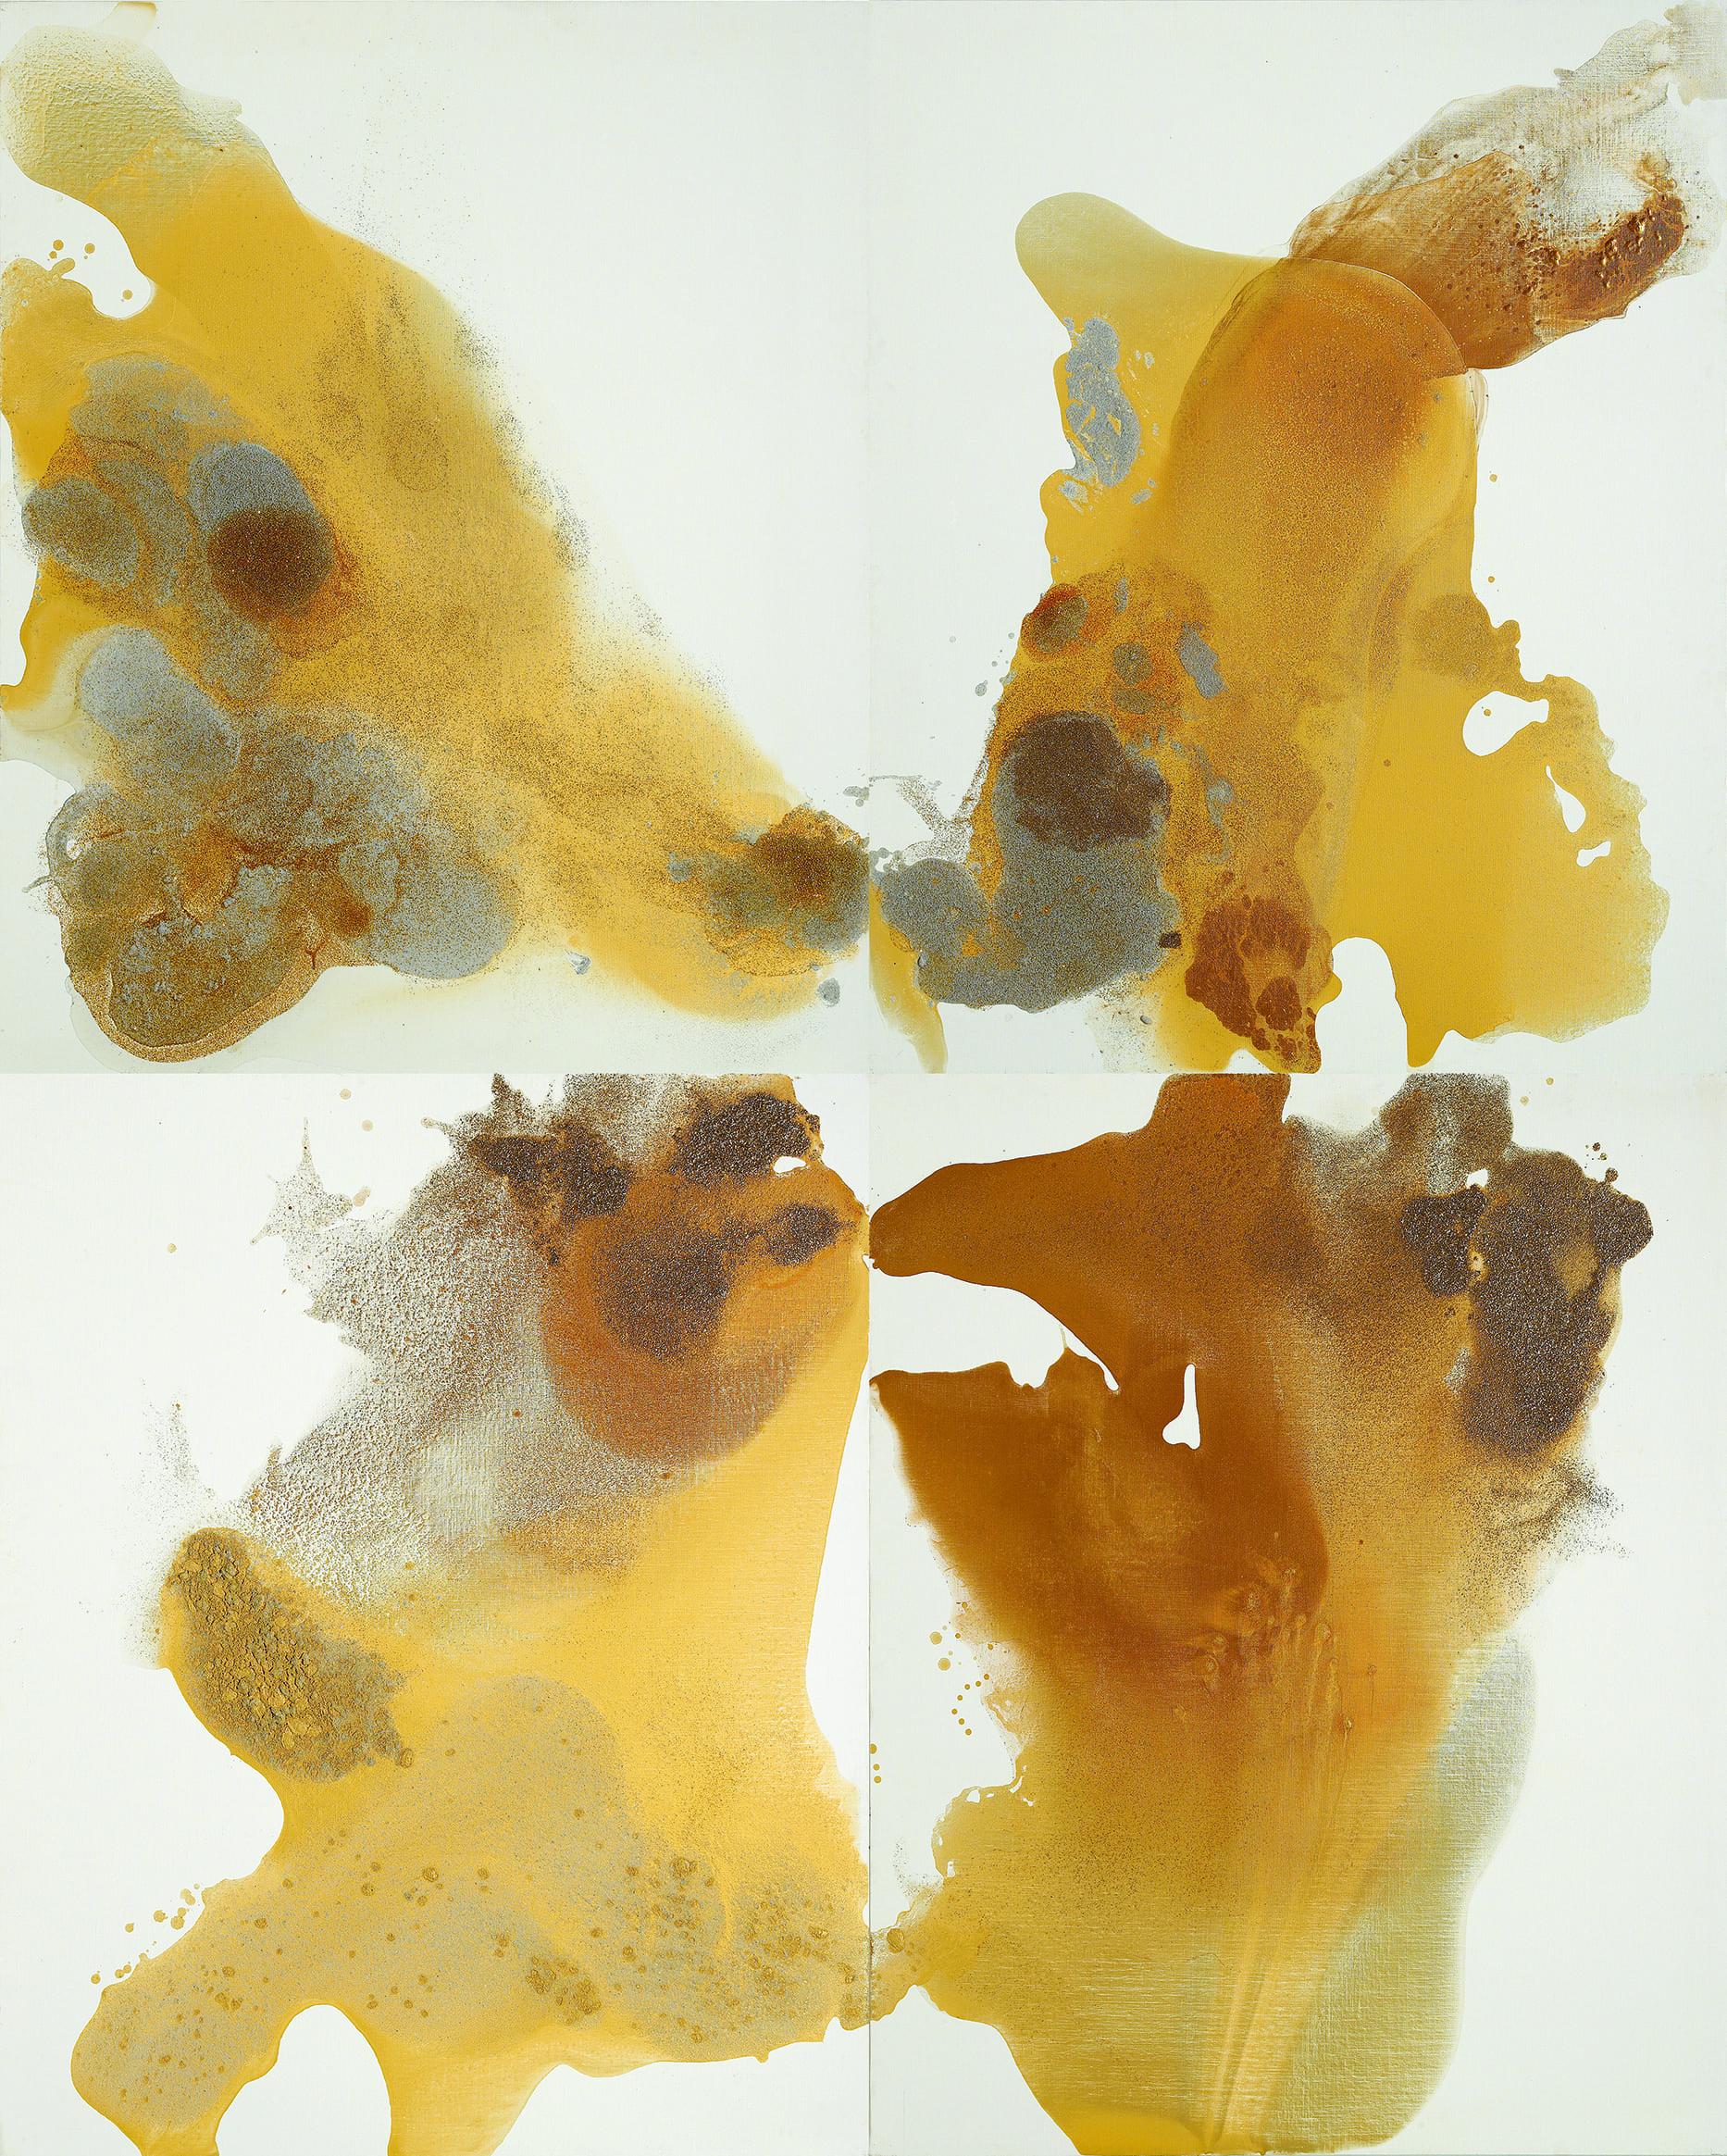 figure_21  acrylic and pumice  gel on canvas  260 cm X 324 cm  2012